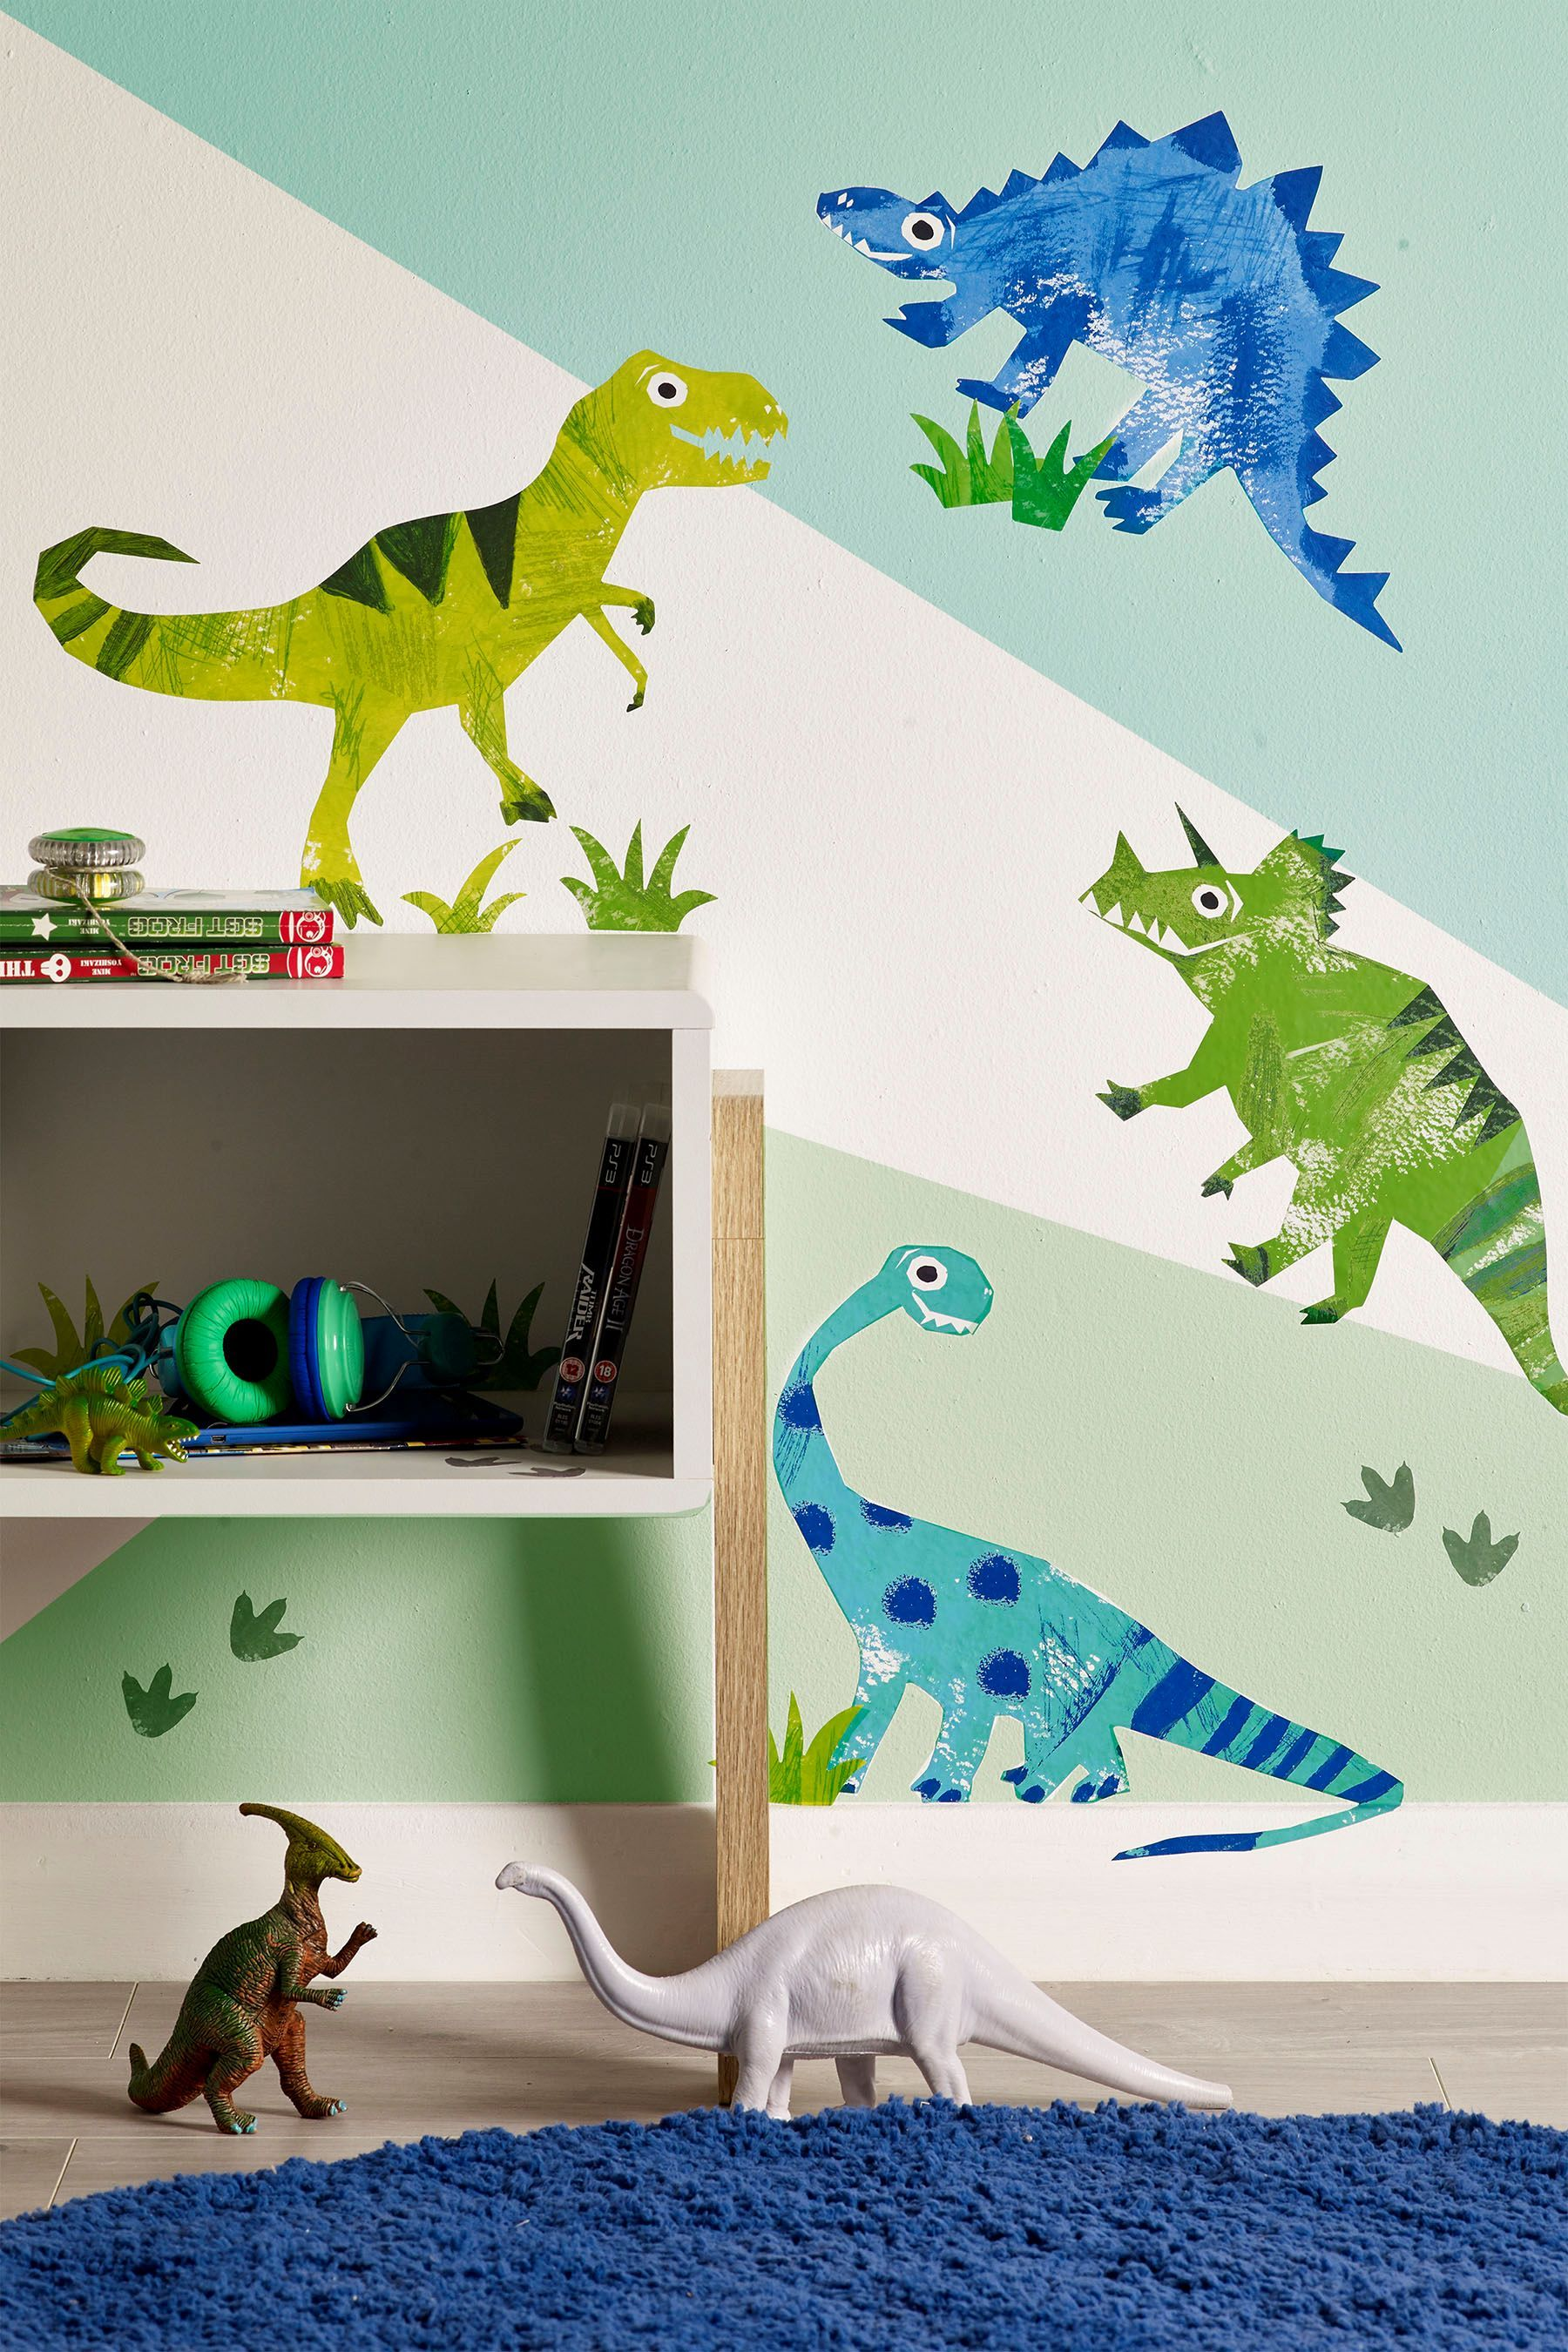 Next Ben The Dino Wall Sticker Wallpaper - Blue | pap in ...